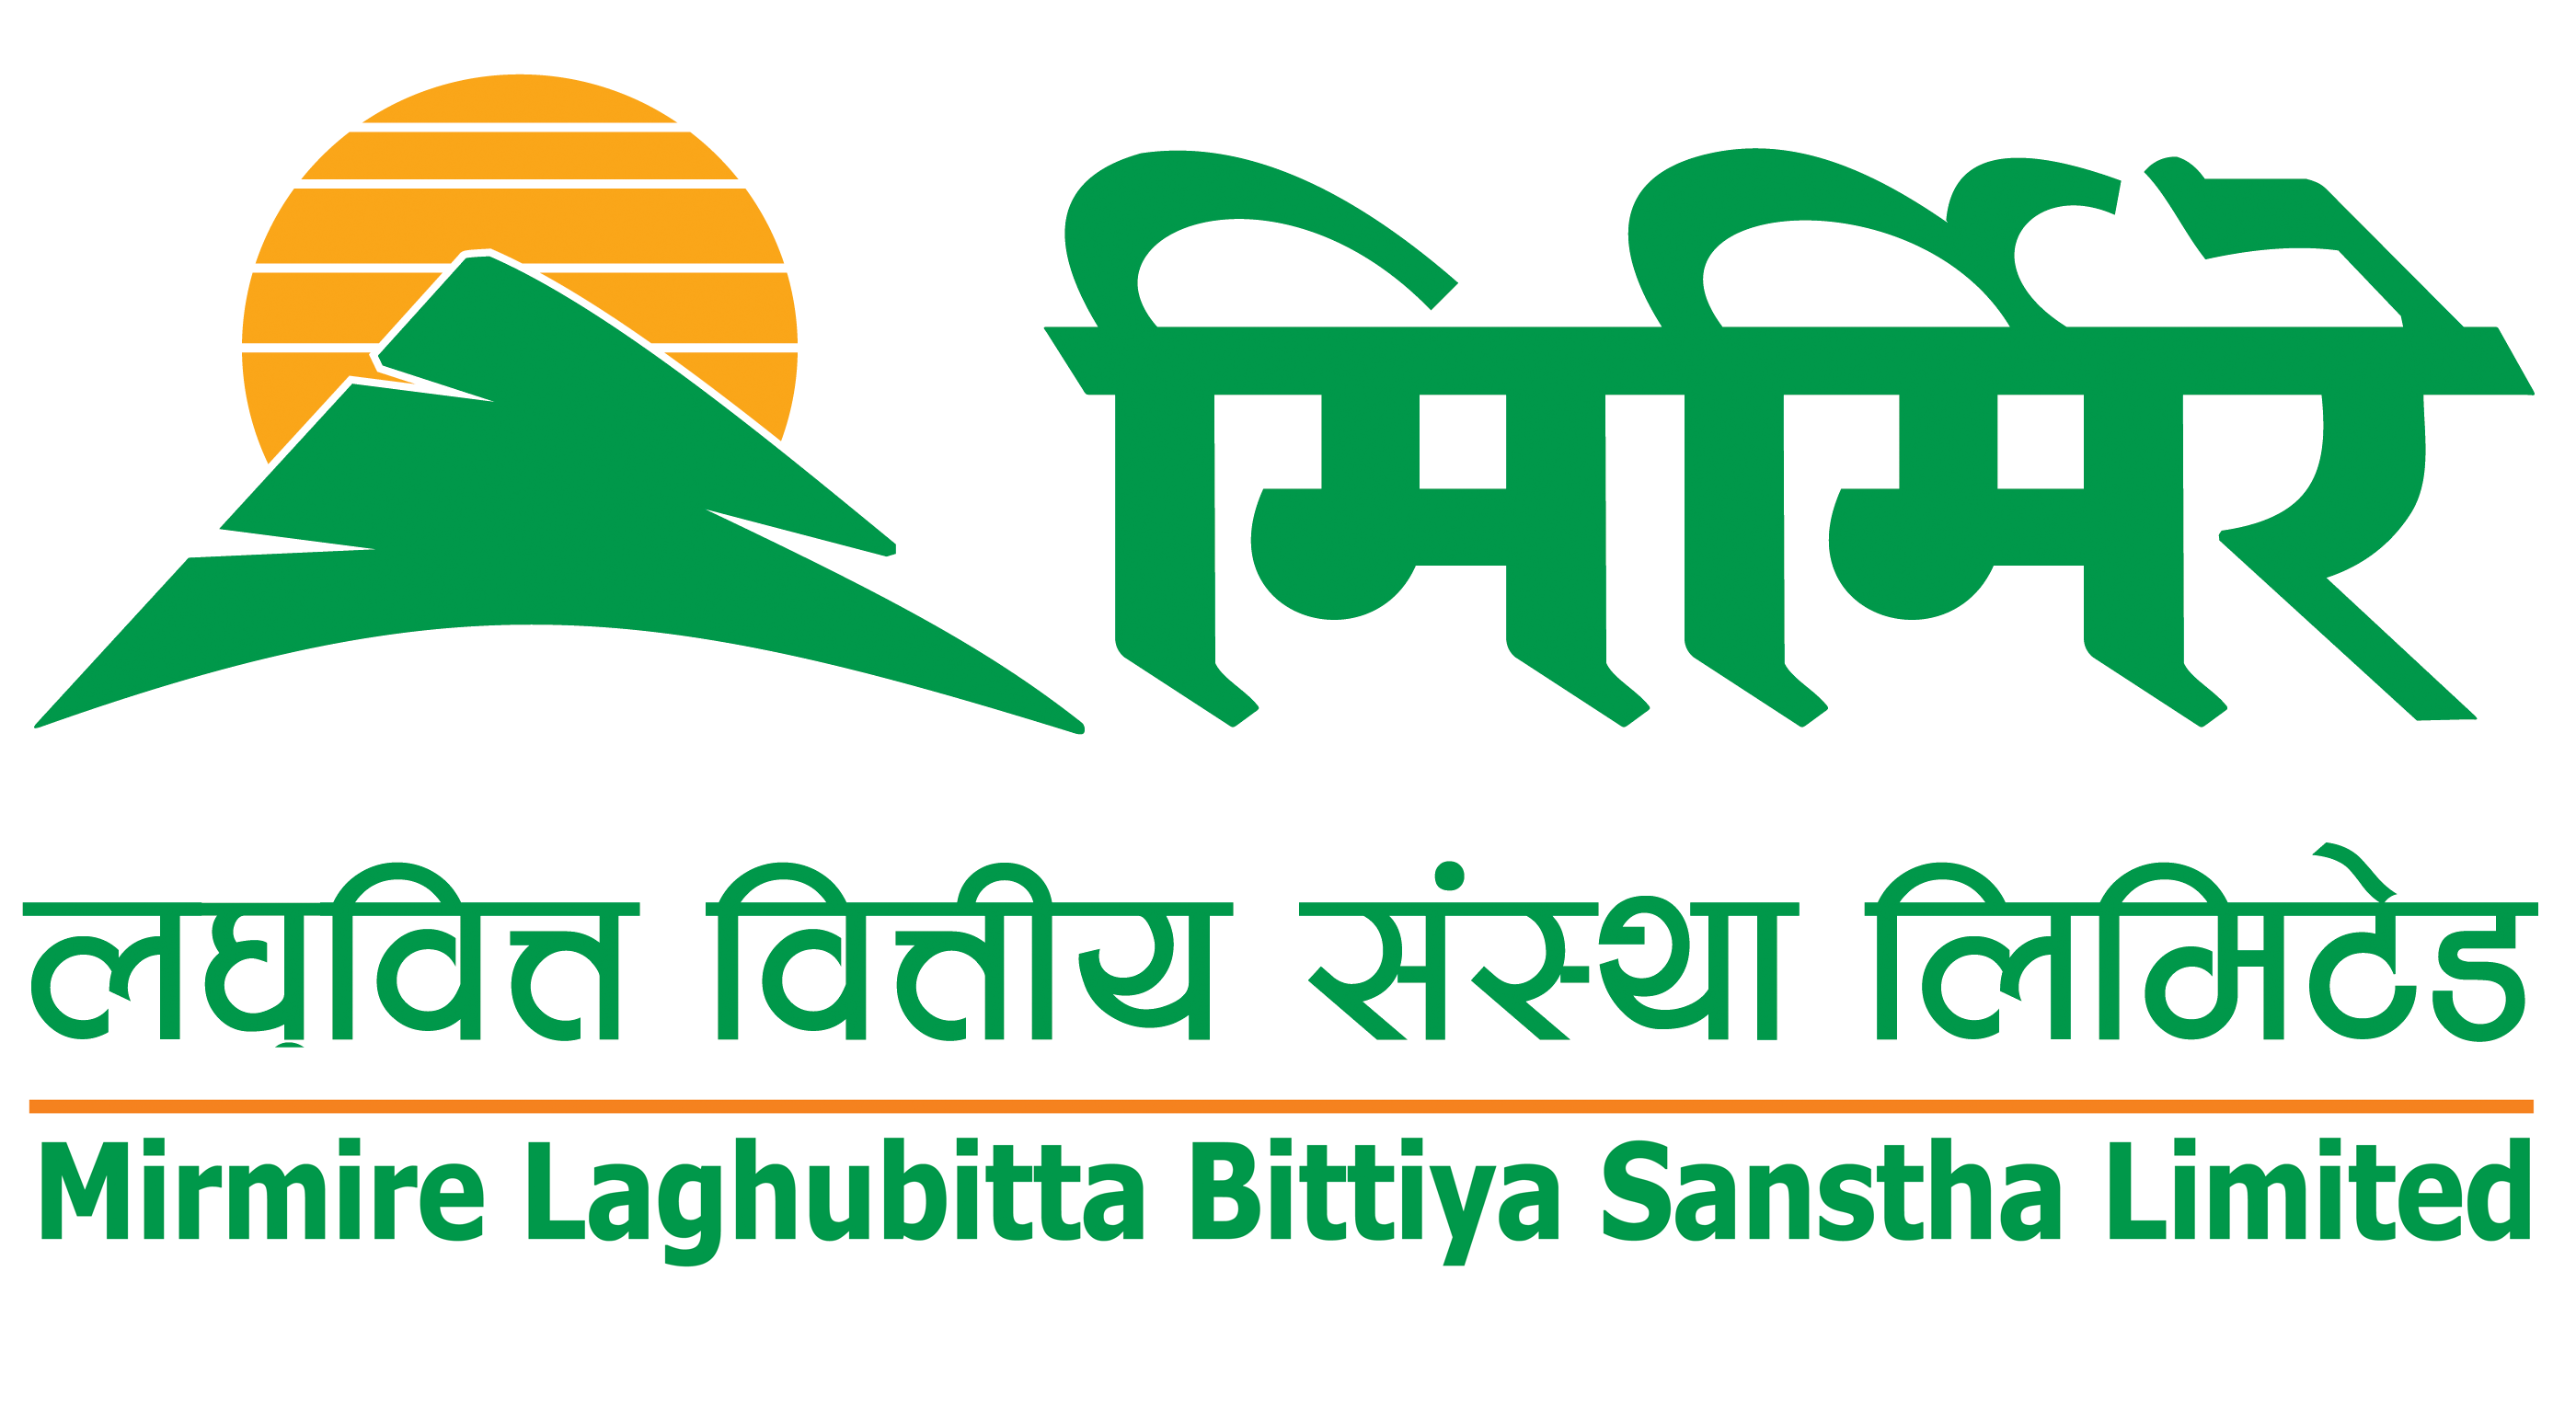 Mirmire Laghubitta Bittiya Sanstha Ltd..